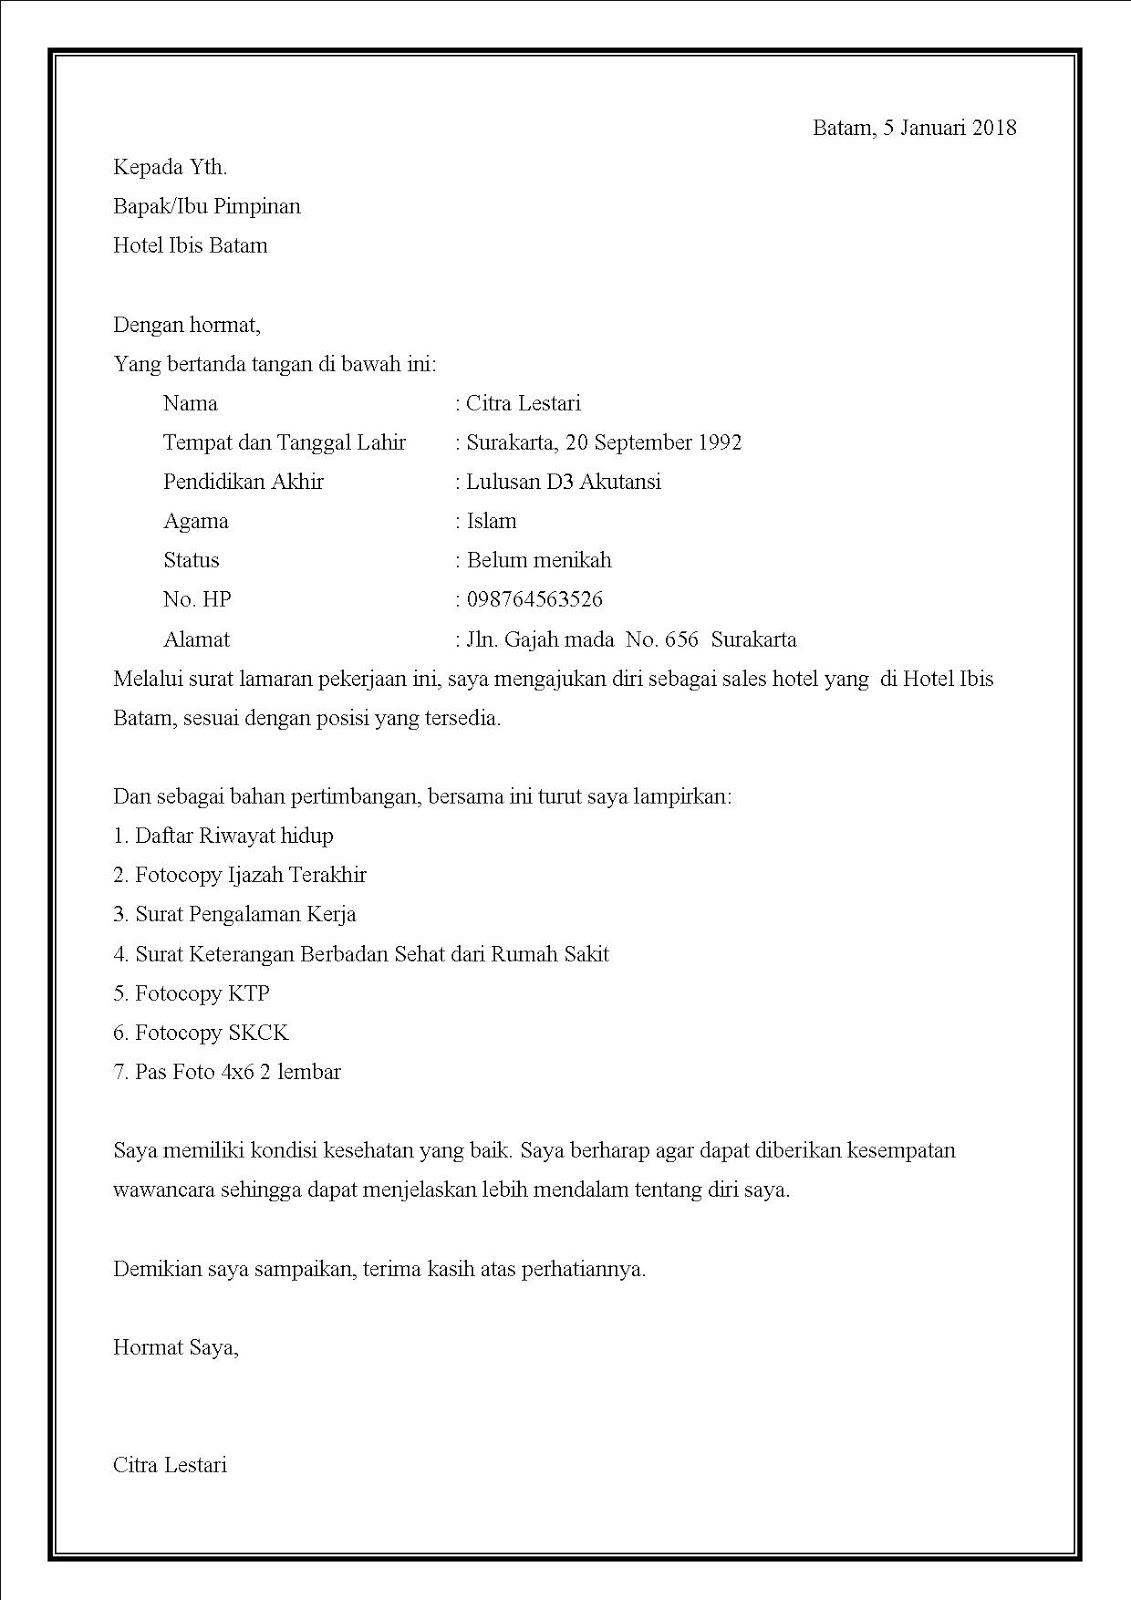 Contoh surat lamaran kerja di hotel menggunakan bahasa Indonesia yang baik dan benar